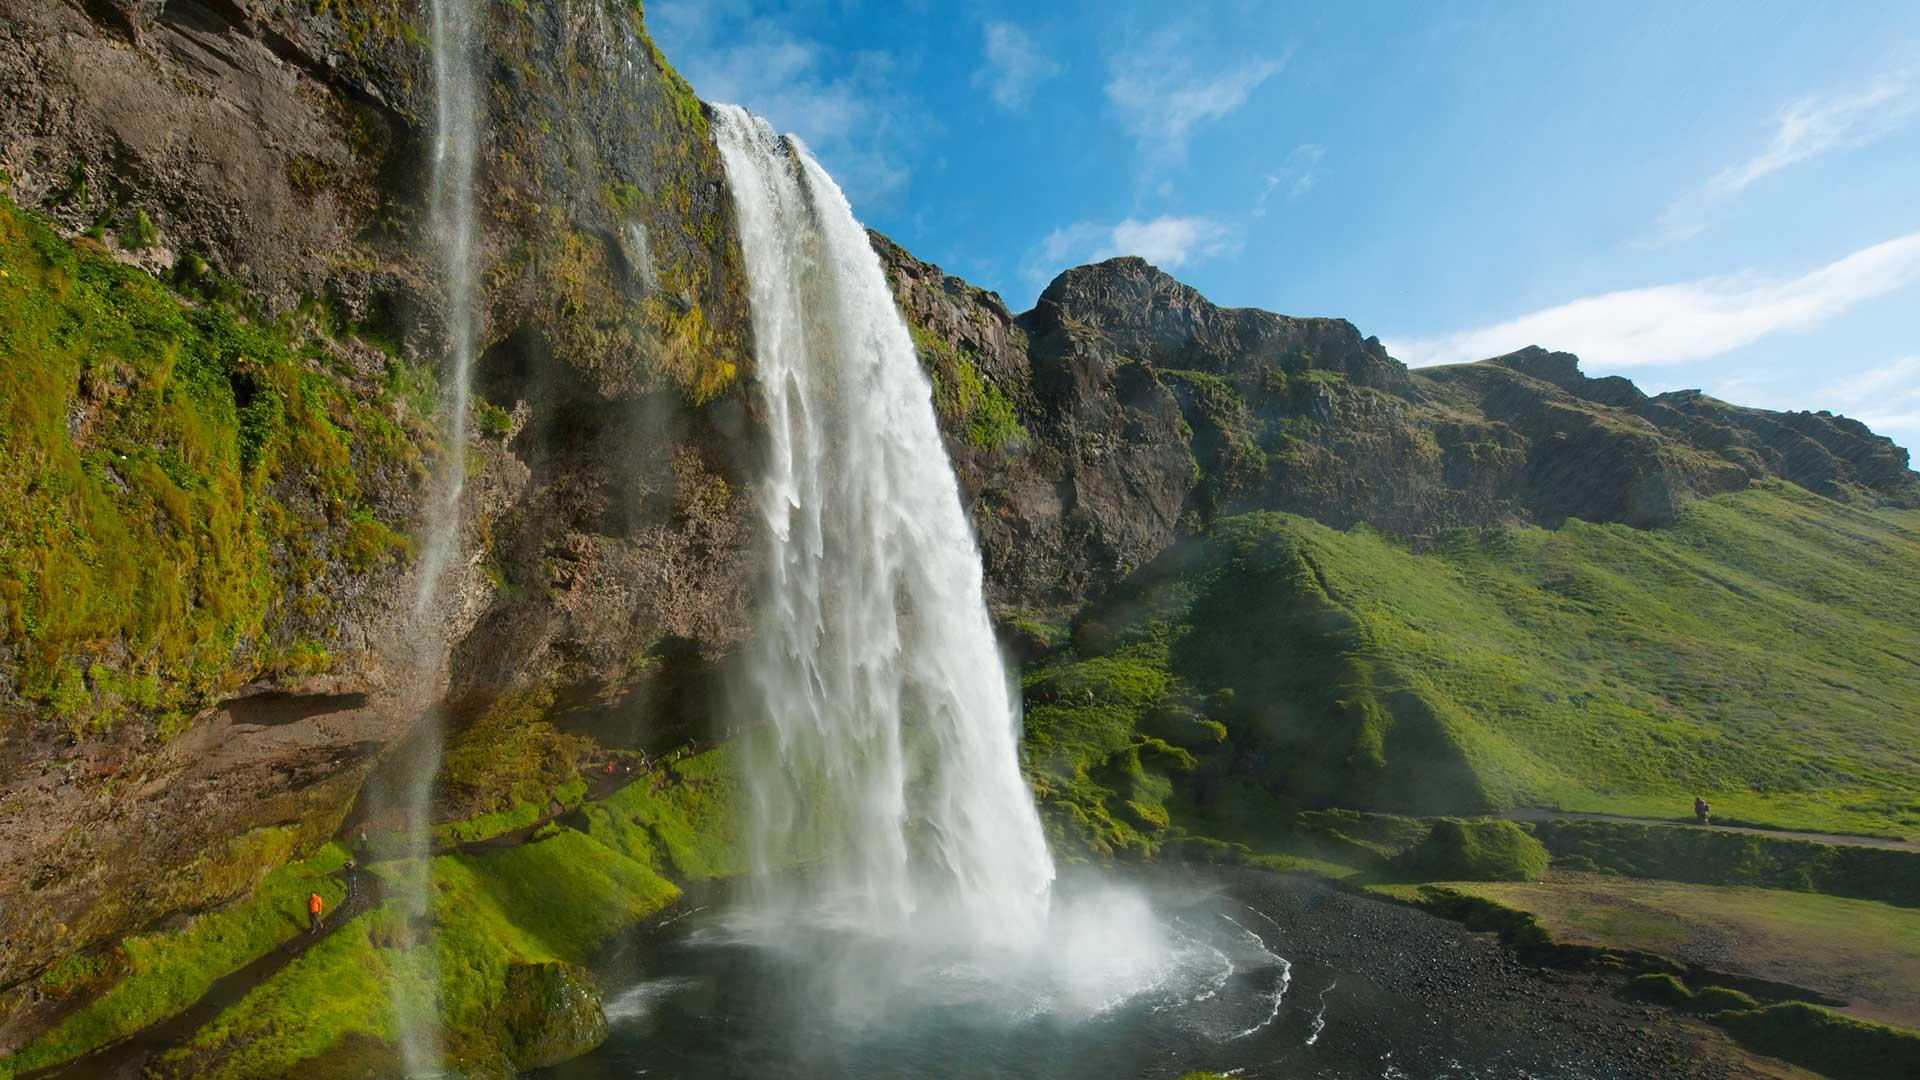 Animated Fall Wallpaper Seljalandsfoss Waterfall South Iceland Travel Guide